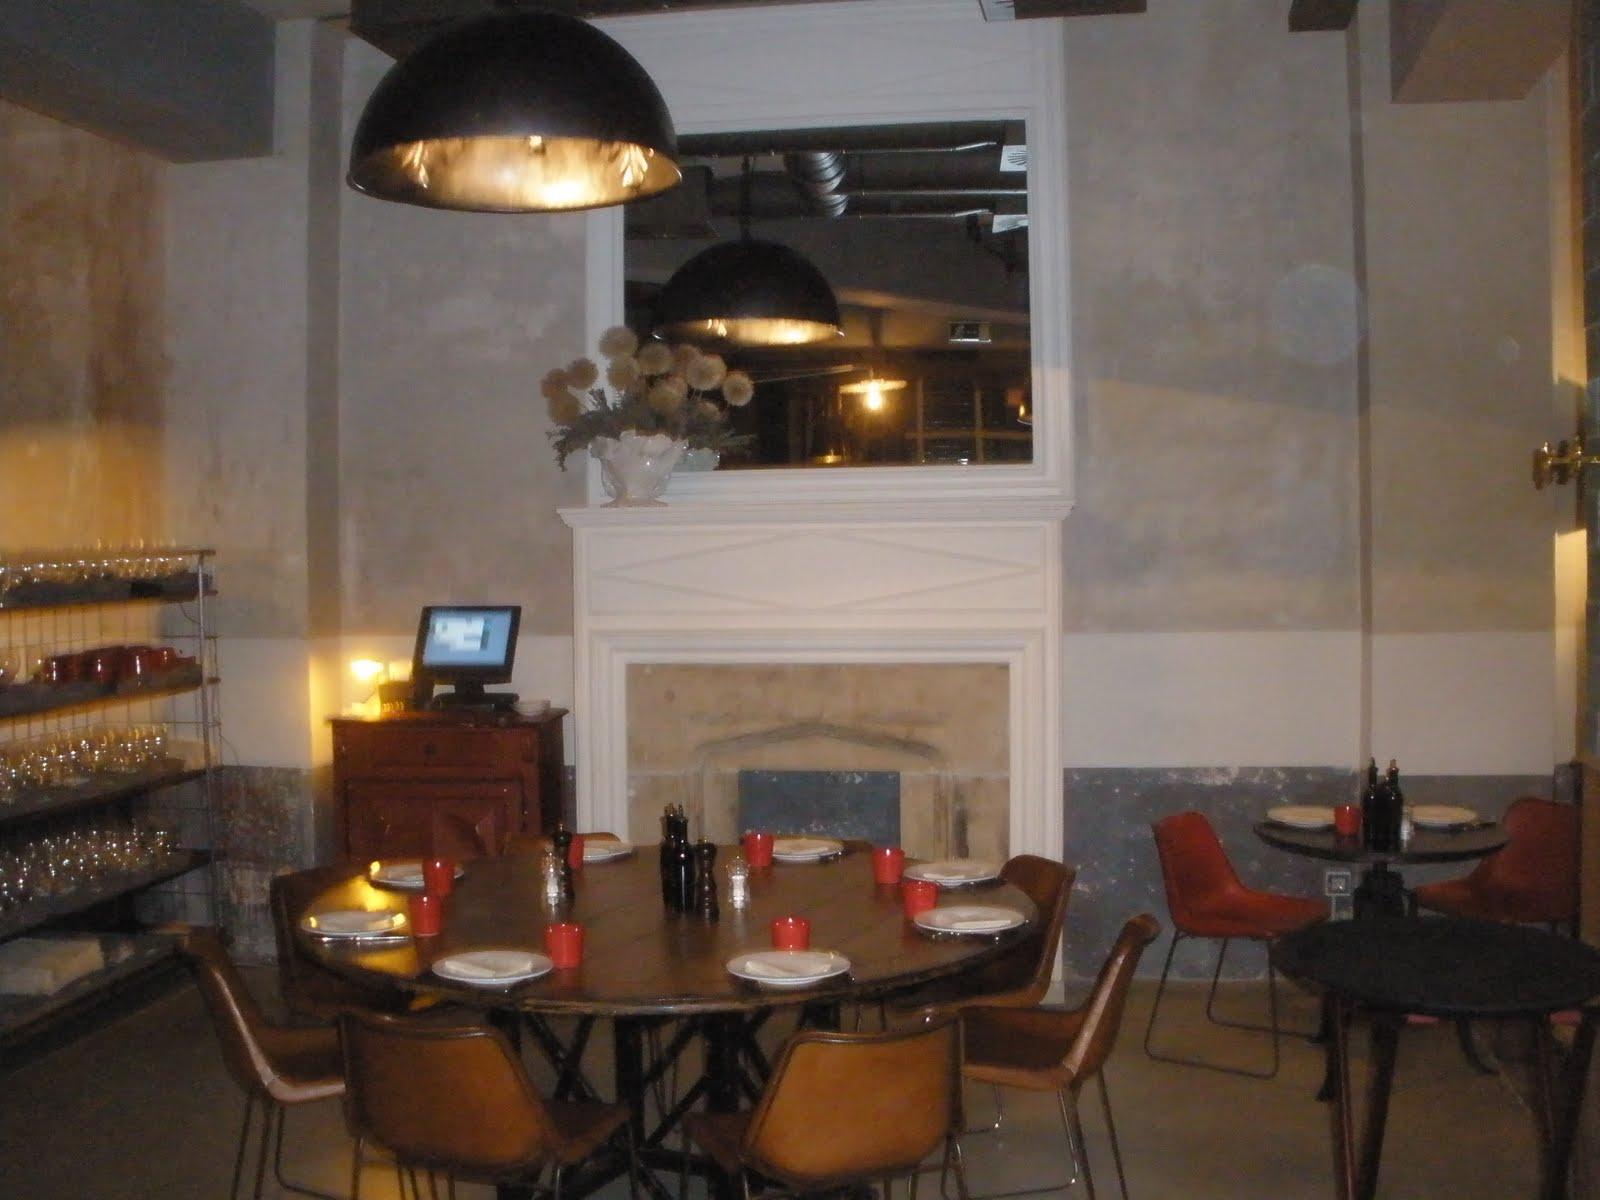 Casa paloma barcelona observaci n gastron mica 2 - Restaurante casa paloma barcelona ...